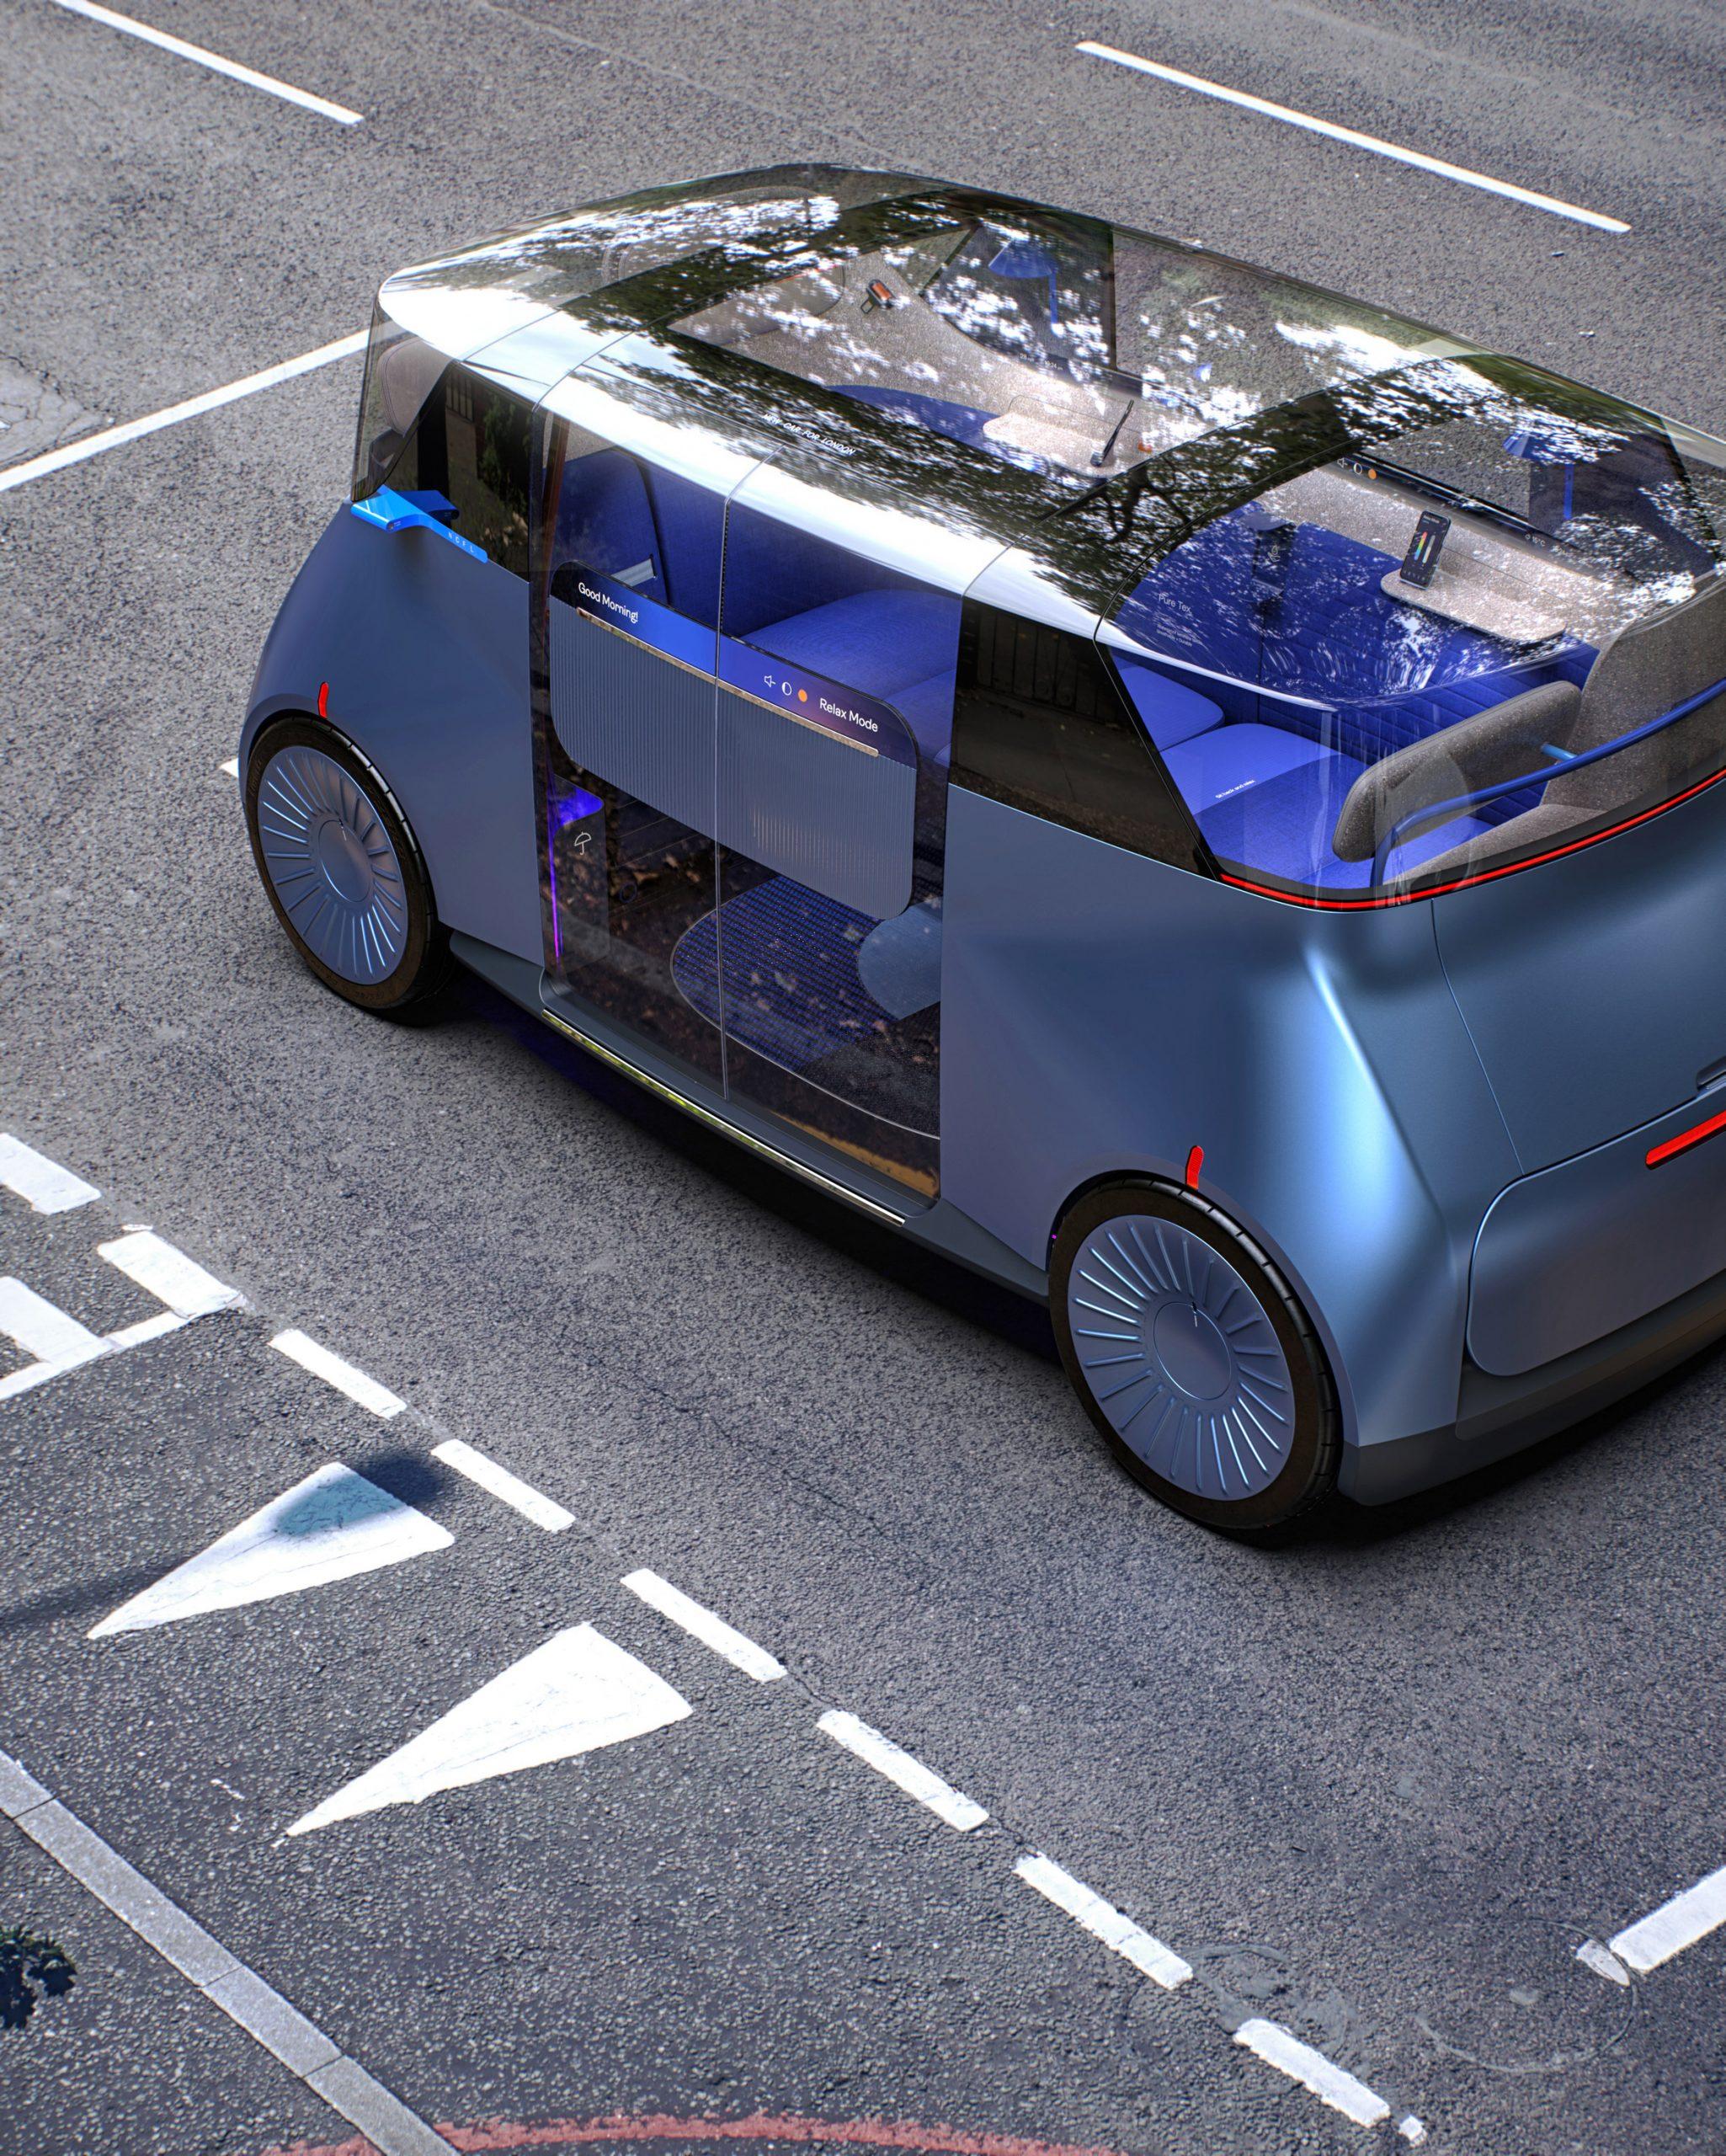 Exterior of PriestmanGoode's autonomous ride-hailing vehicle